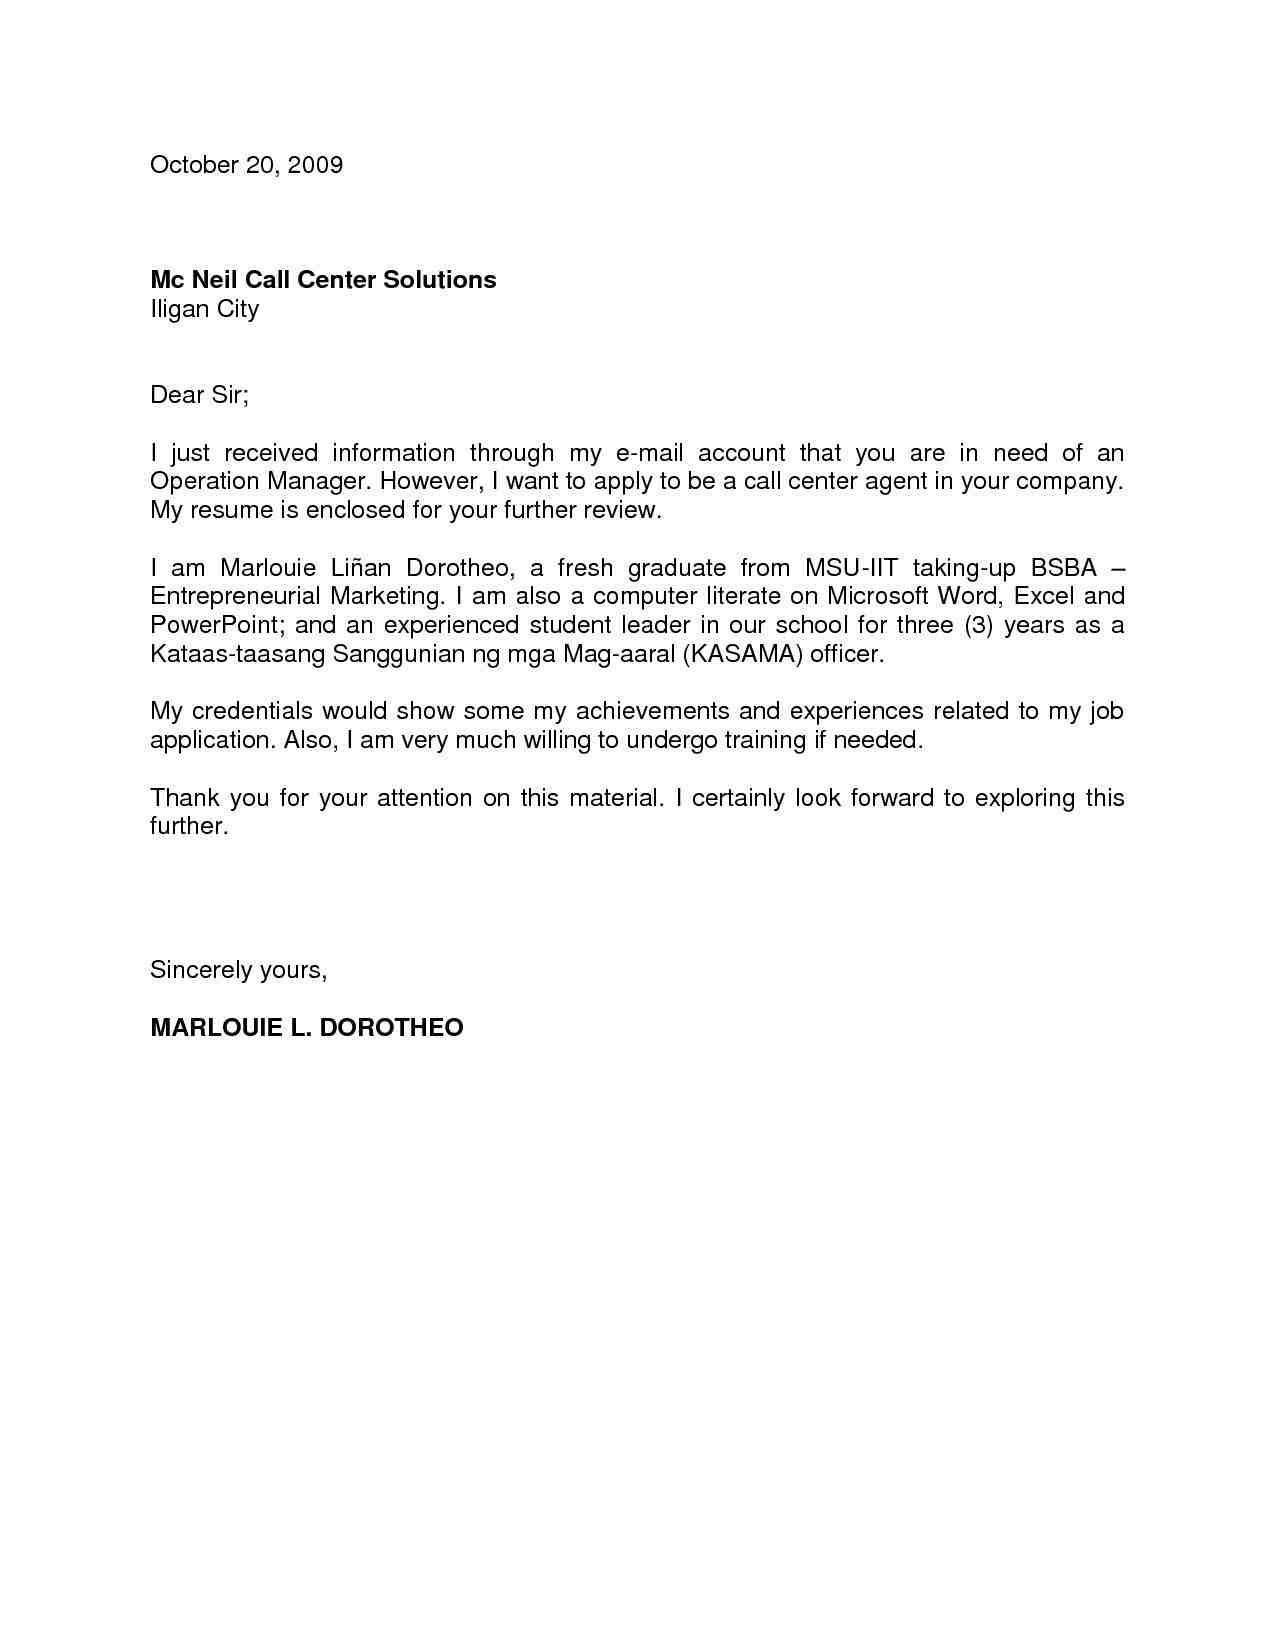 001 Insurance Denial Letter Template Excellent Ideas ...